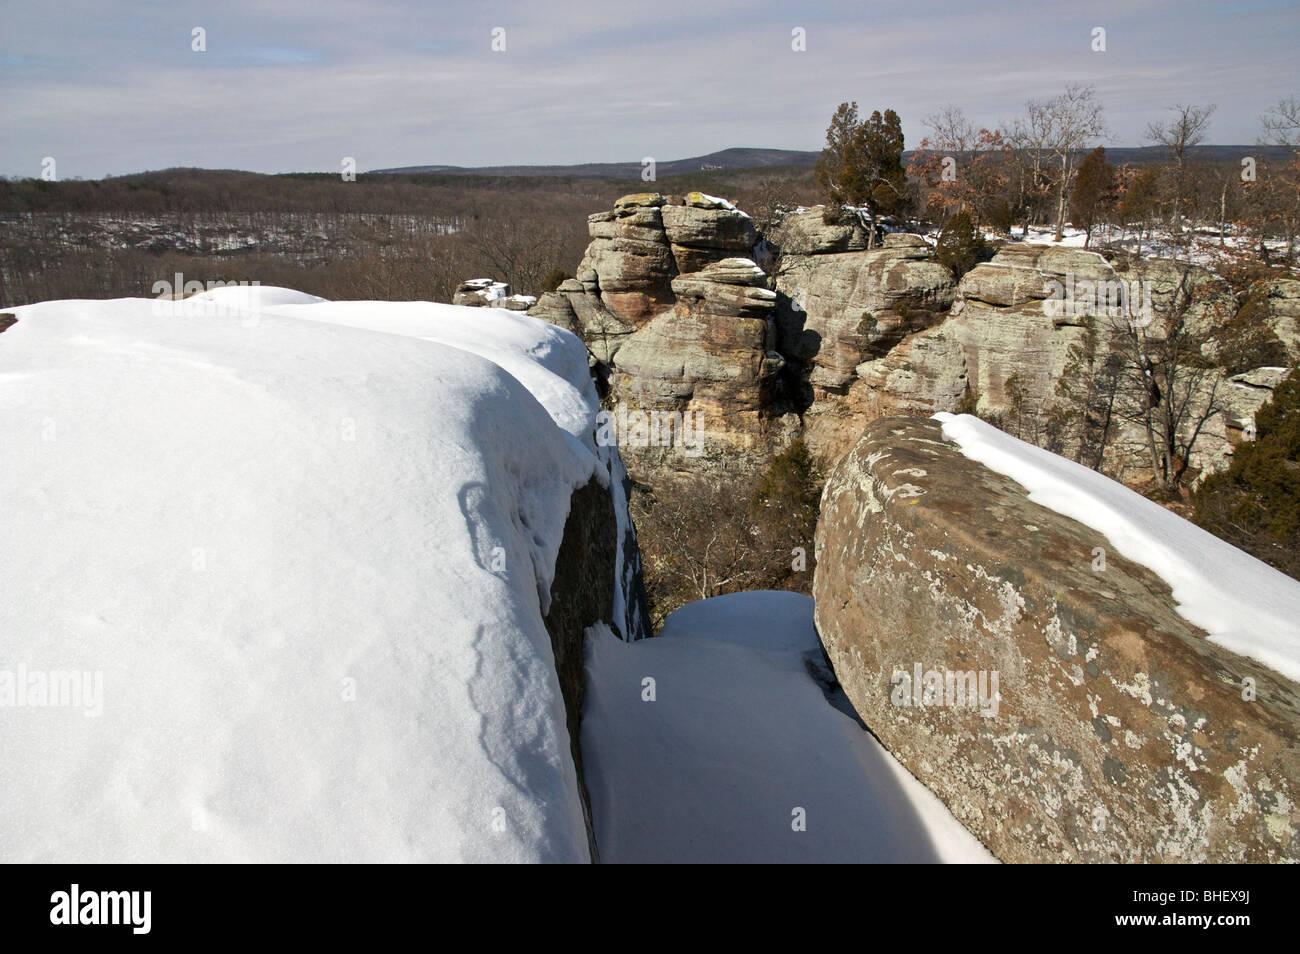 Garden of the Gods Recreation Area in winter. Illinois USA. - Stock Image